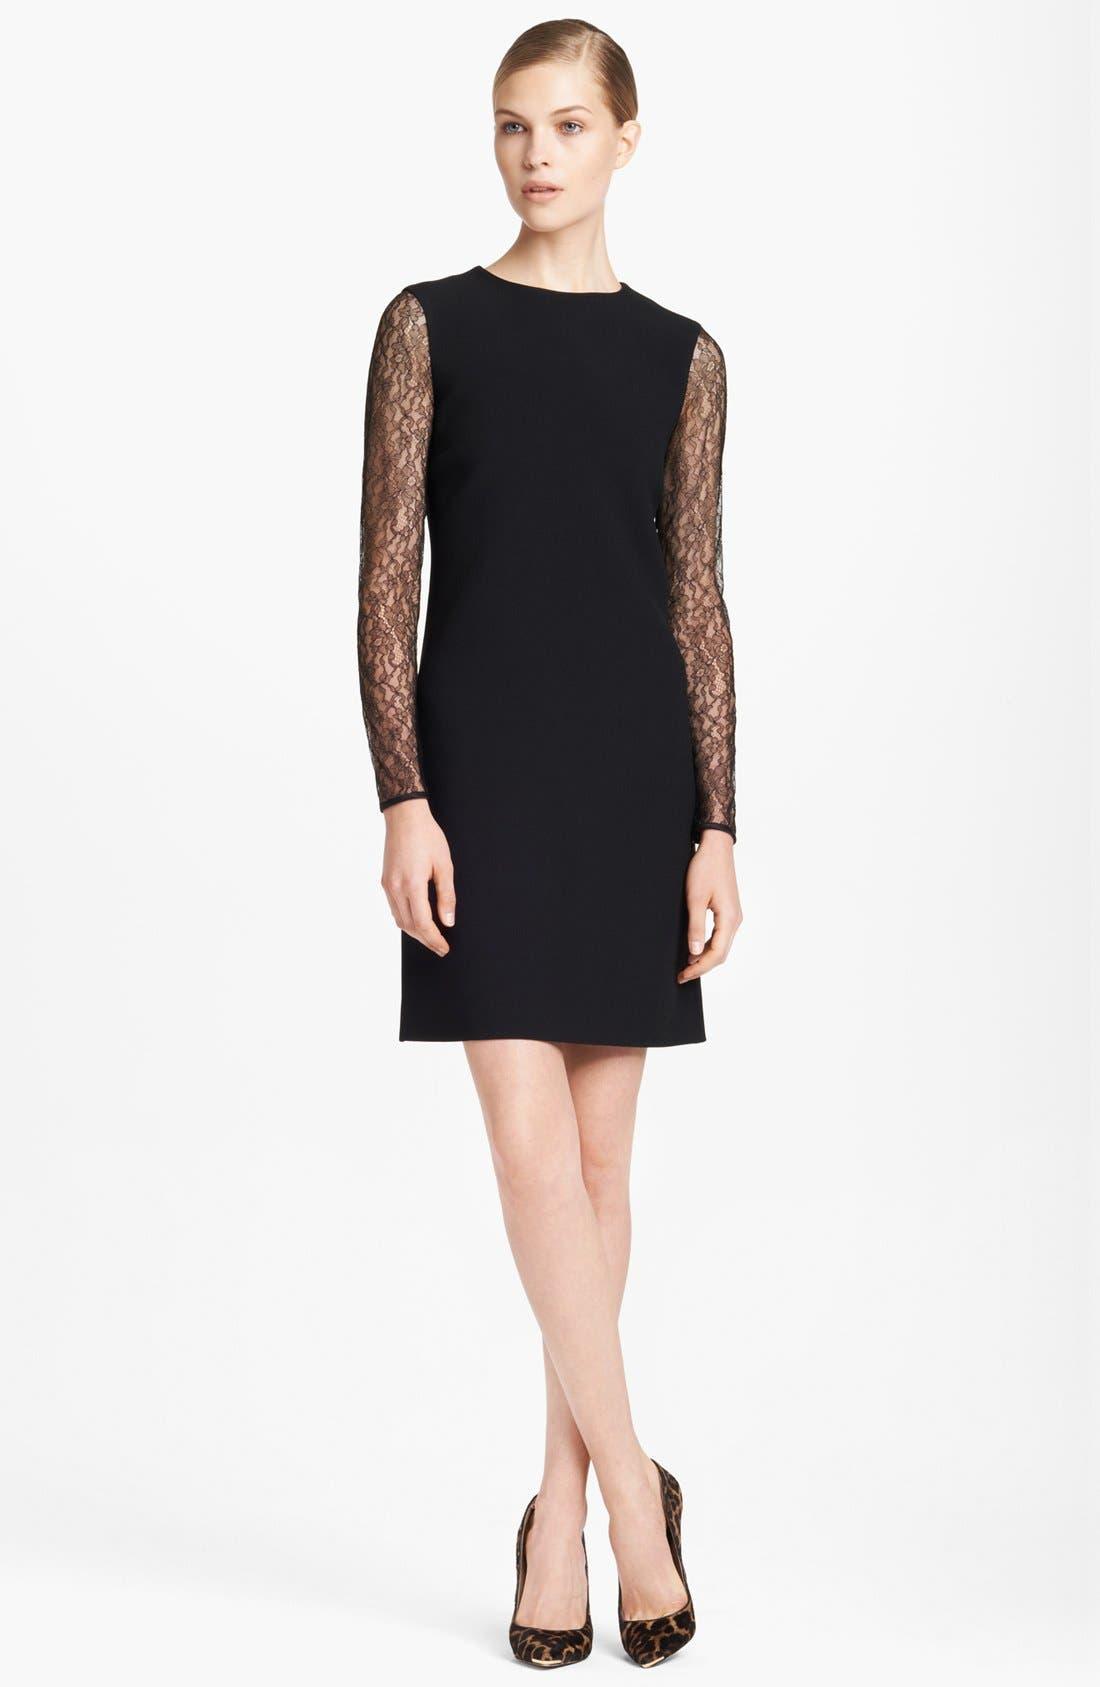 Alternate Image 1 Selected - Michael Kors Lace Sleeve Dress